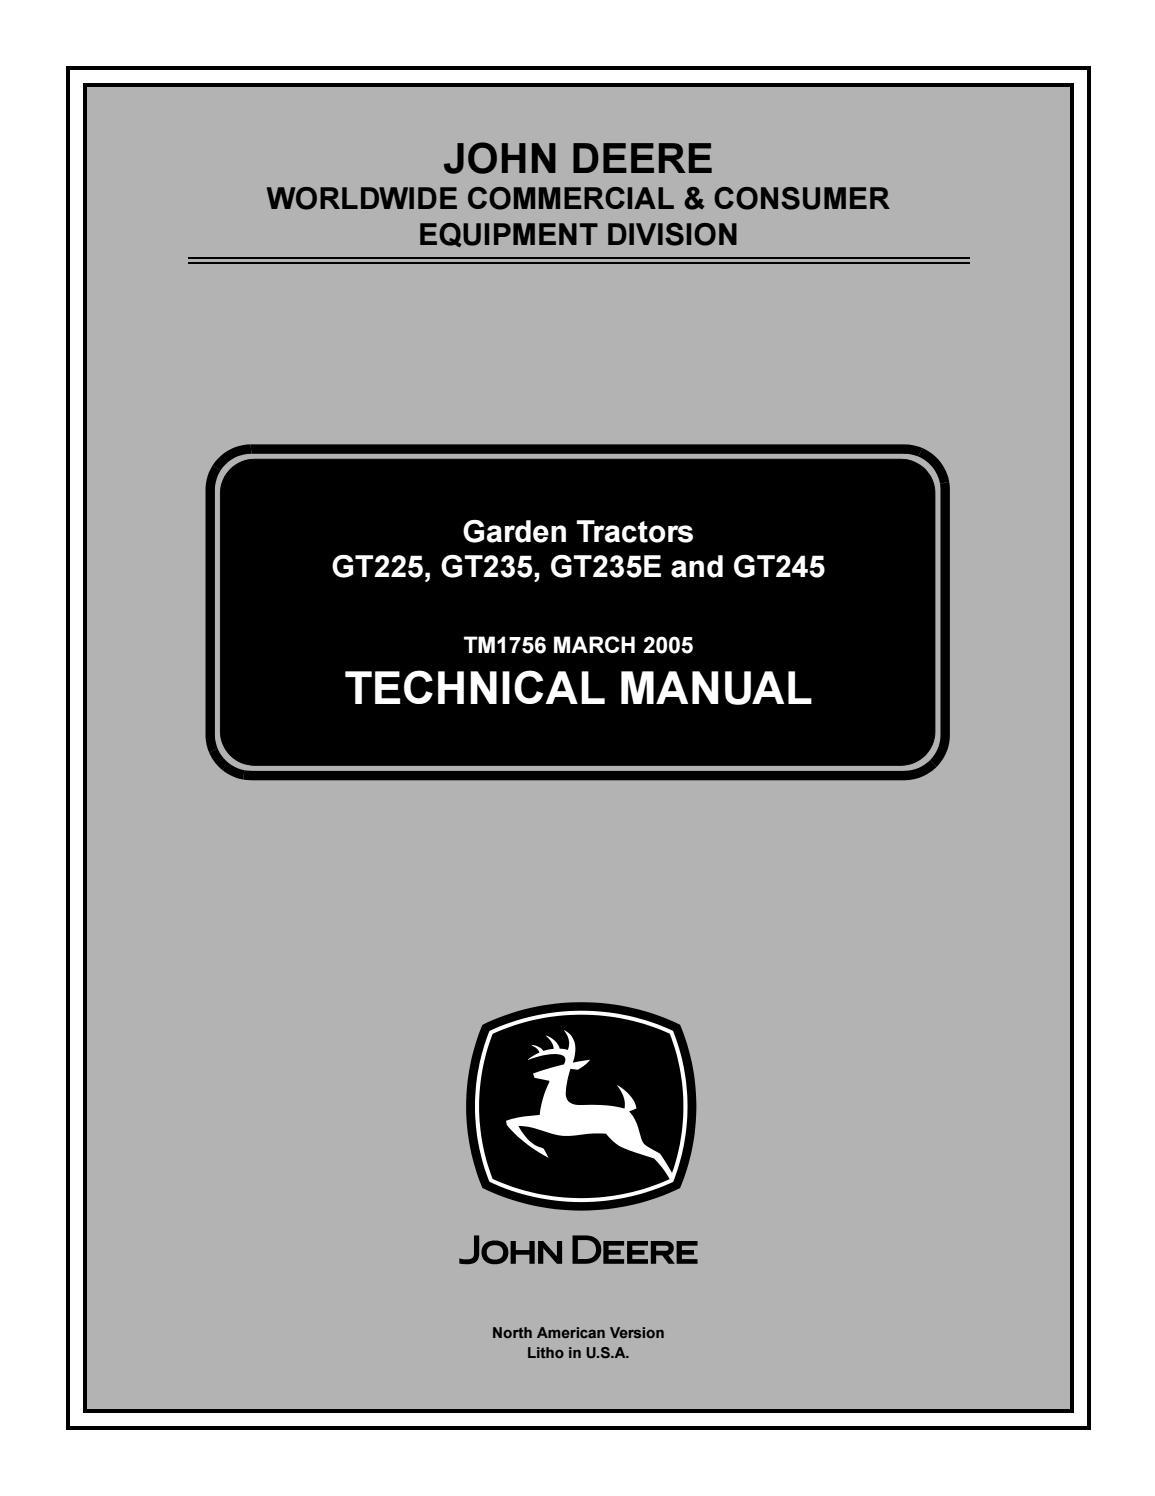 John deere gt245 lawn garden tractor service repair manual